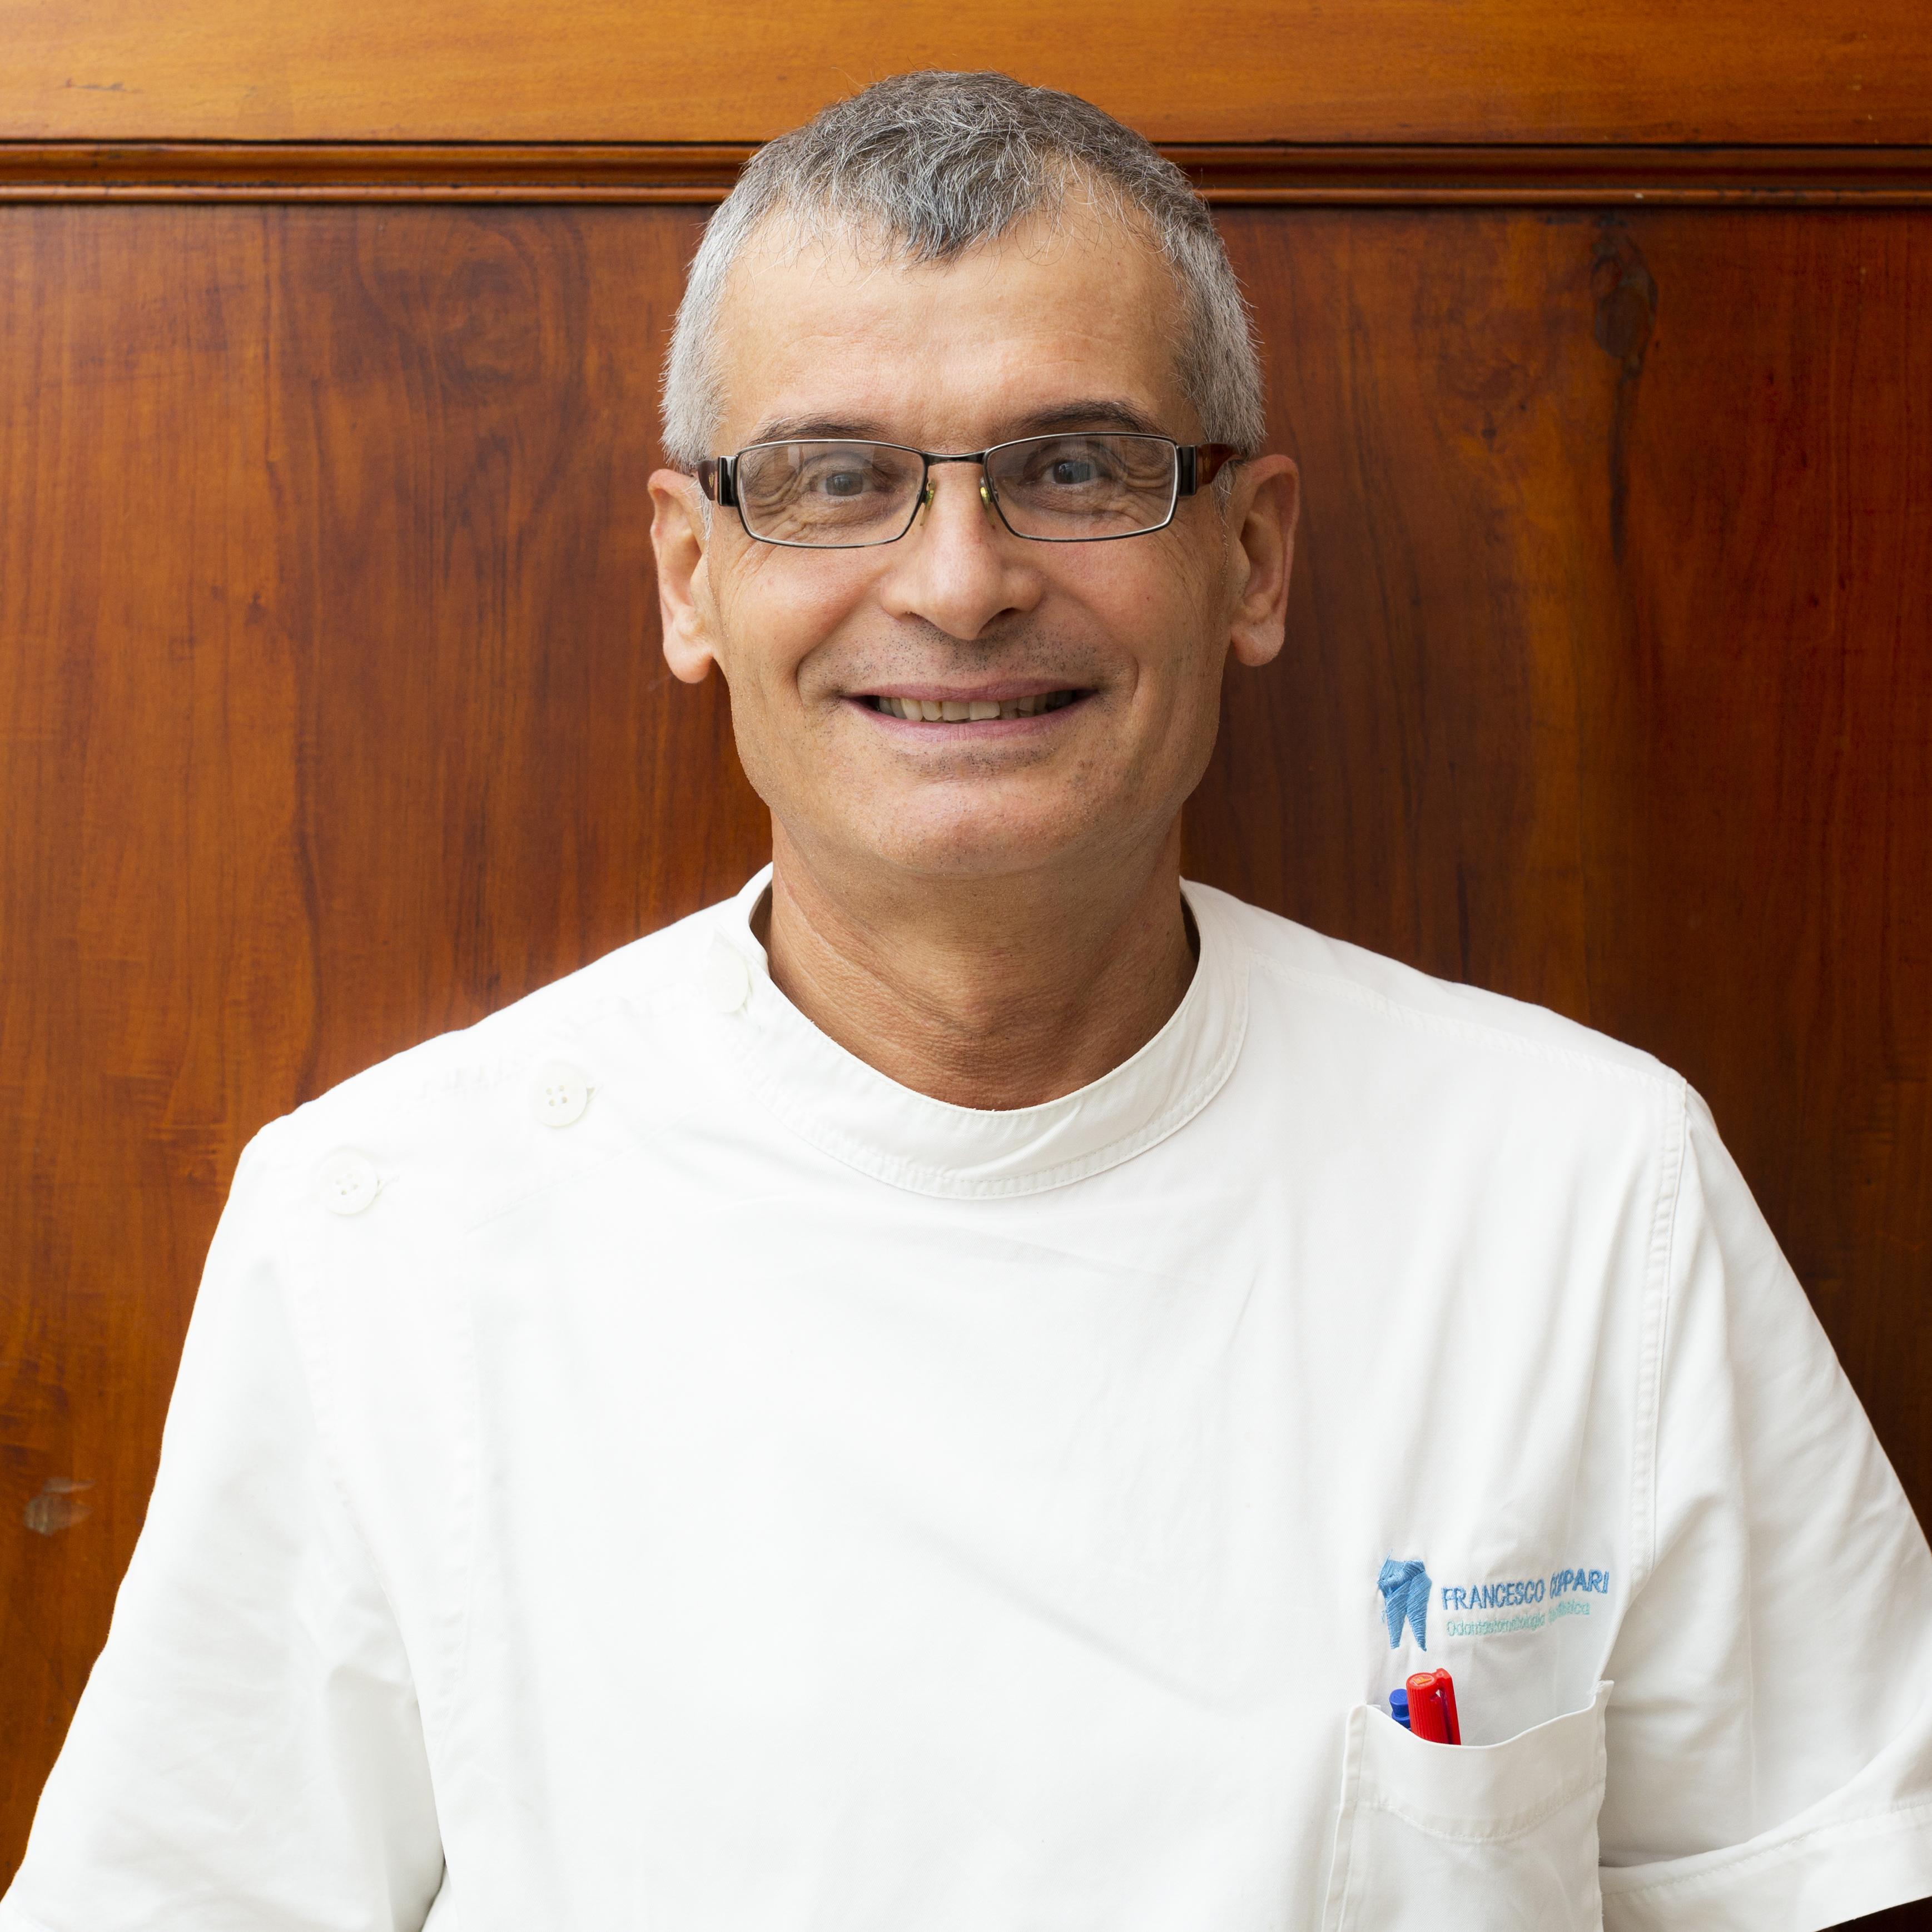 Dott. Francesco Coppari